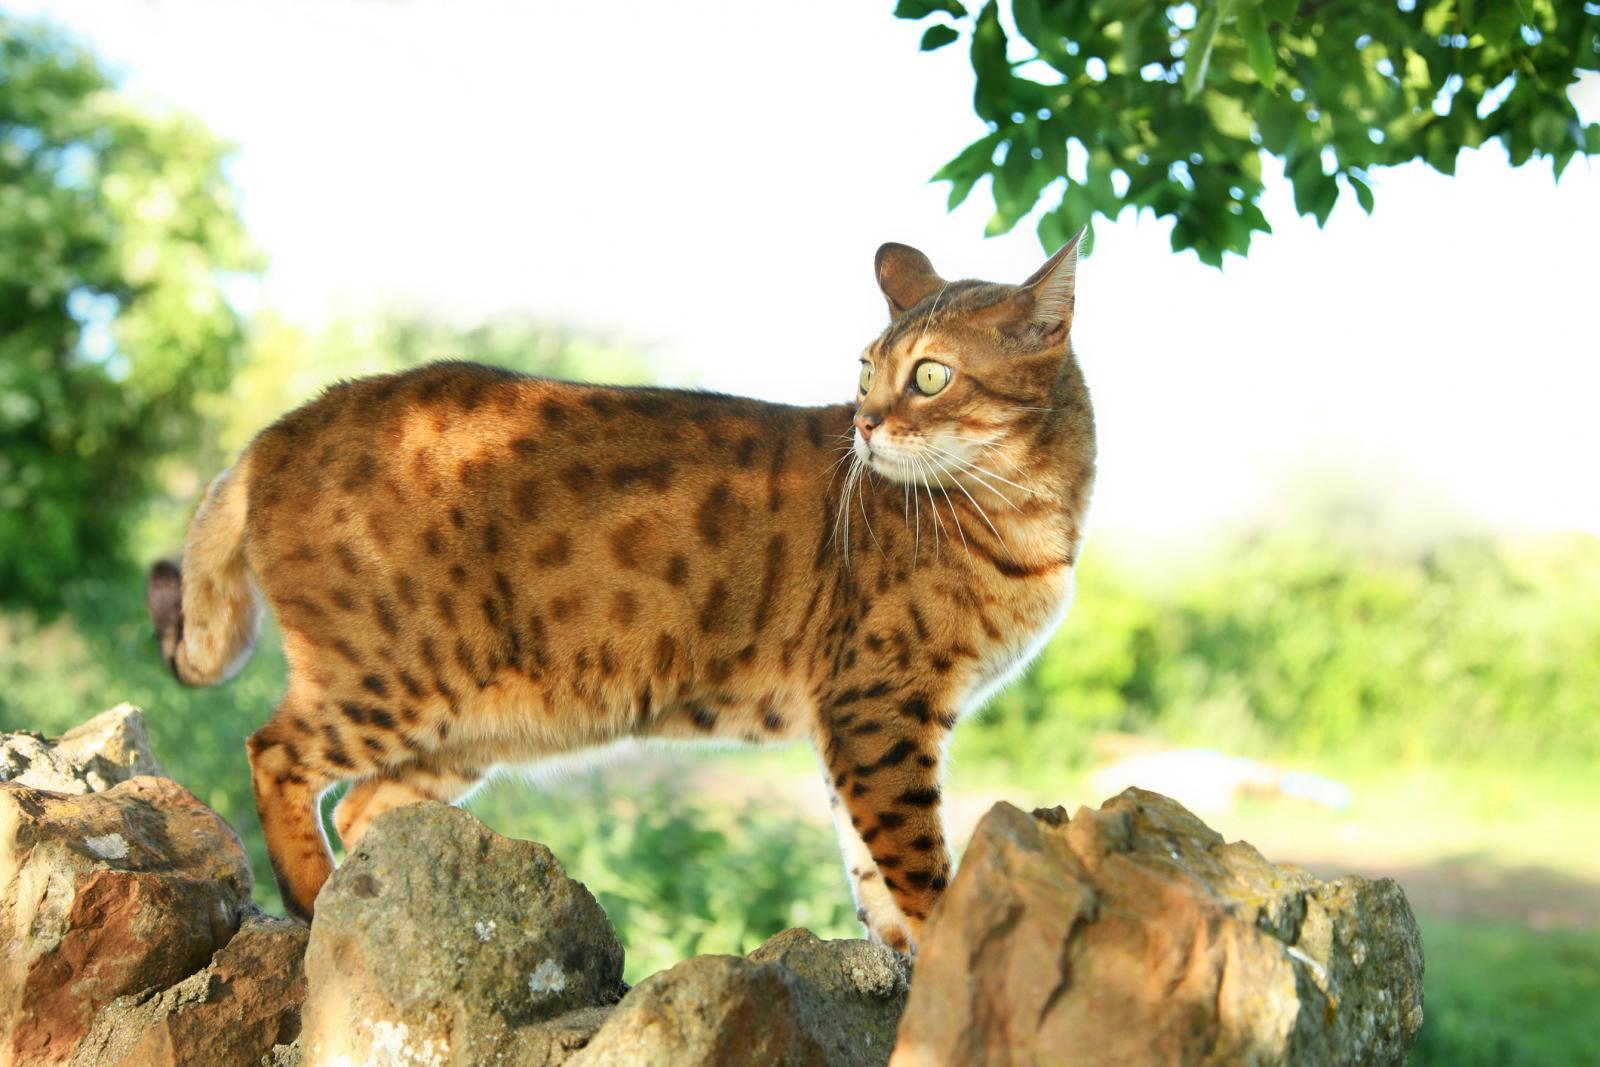 Bengal cat walking along stone wall looking alert